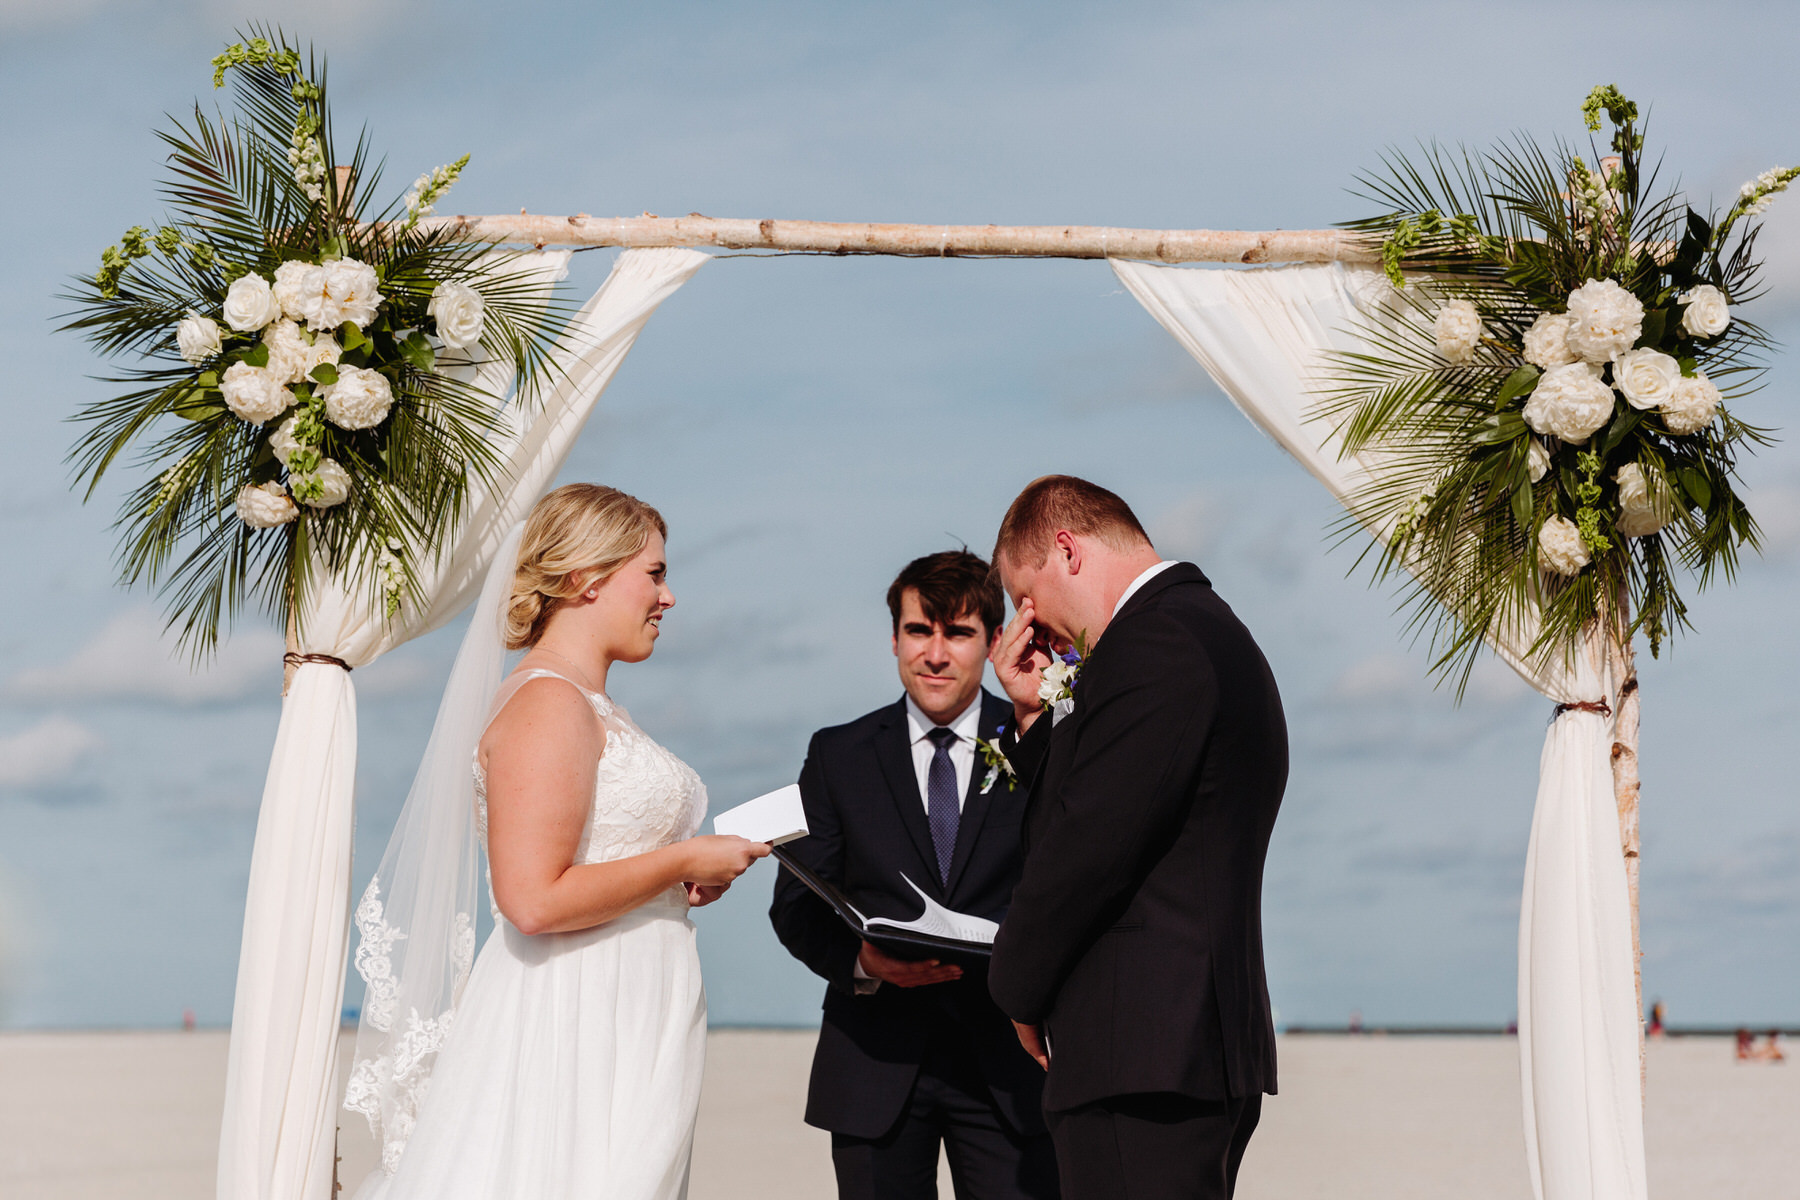 wild-dunes-charleston-isle-of-palms-IOP-wedding-805.JPG